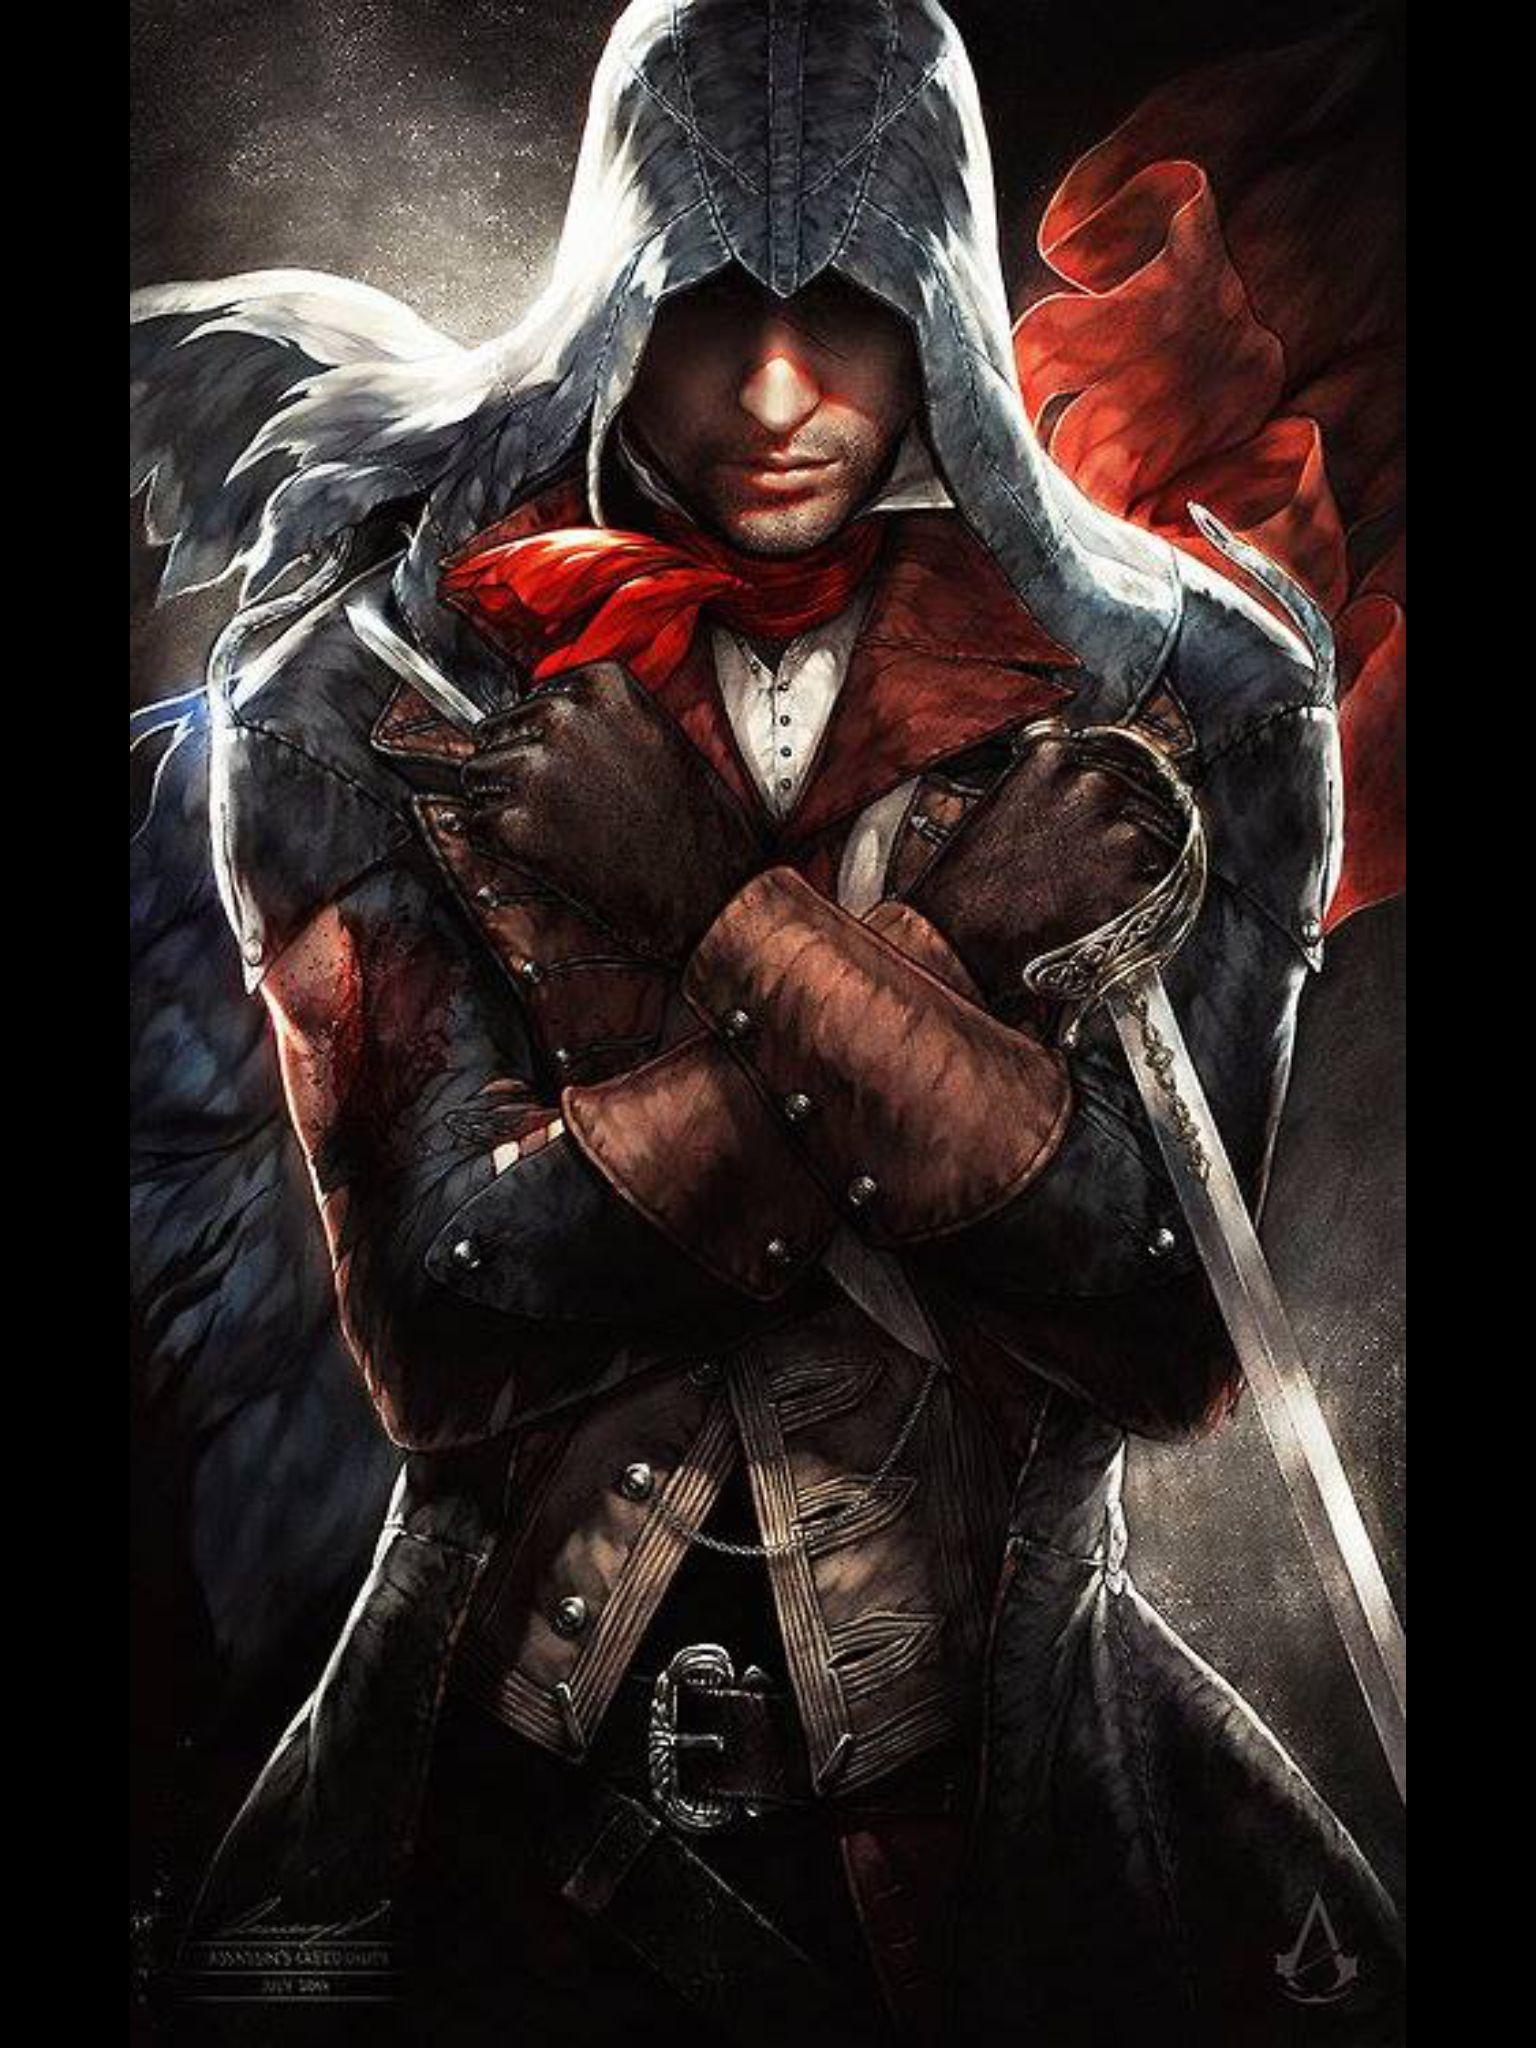 Arno the Assassin